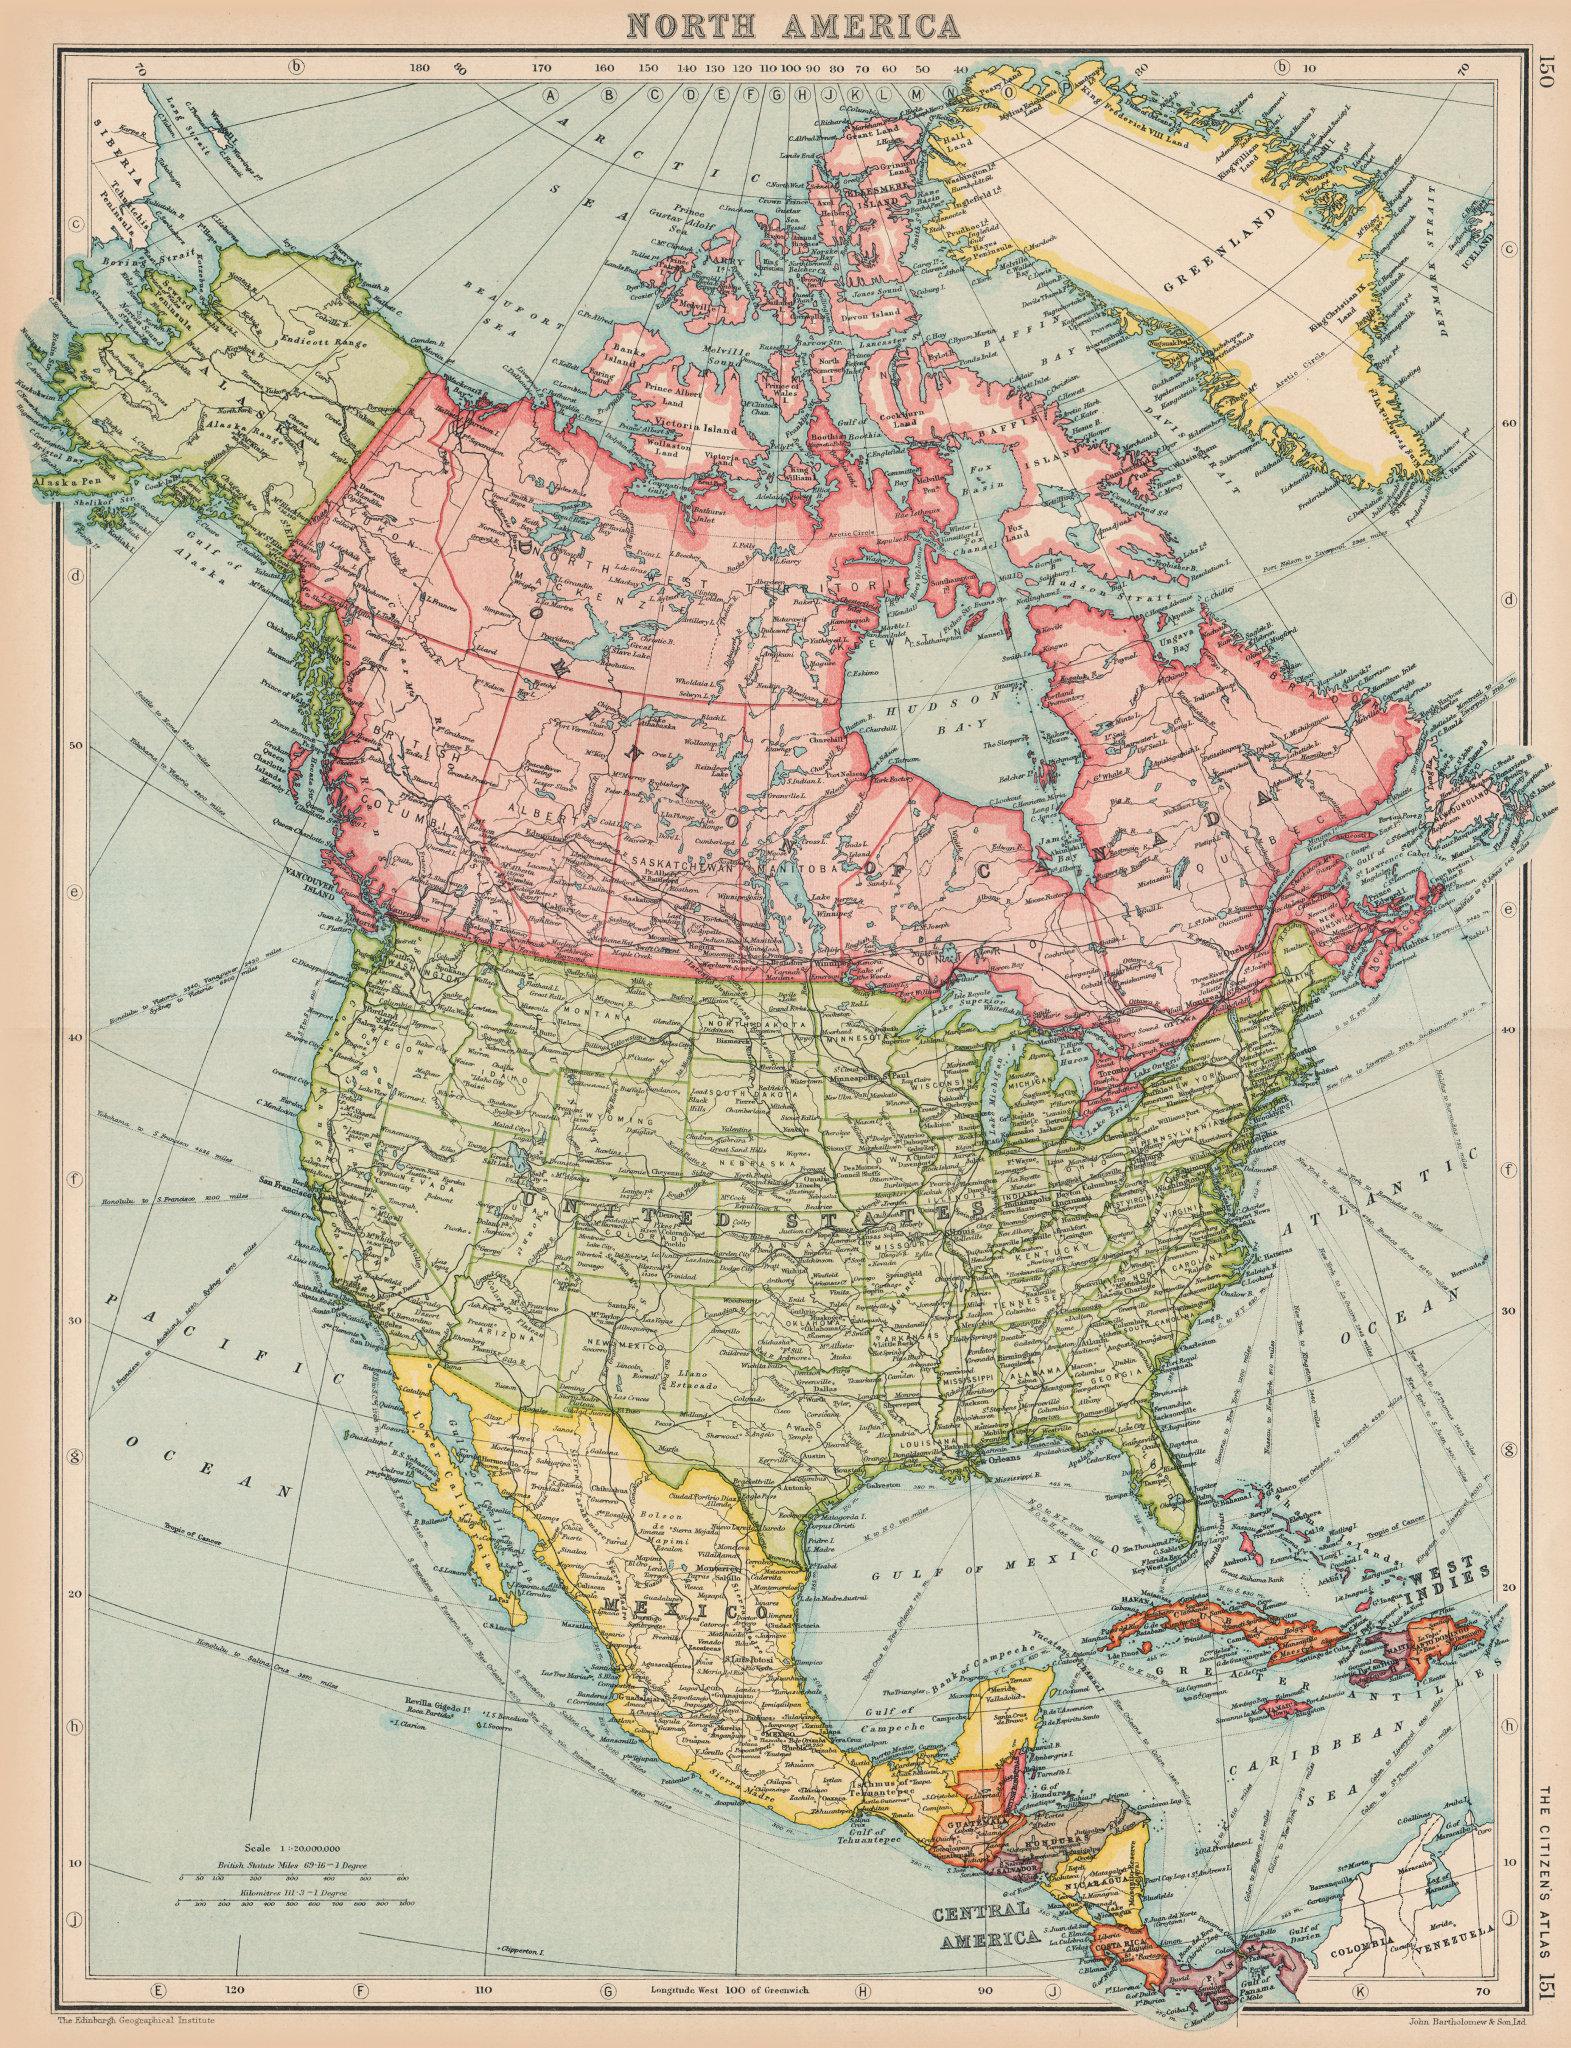 Associate Product NORTH AMERICA. General map. BARTHOLOMEW 1924 old vintage plan chart